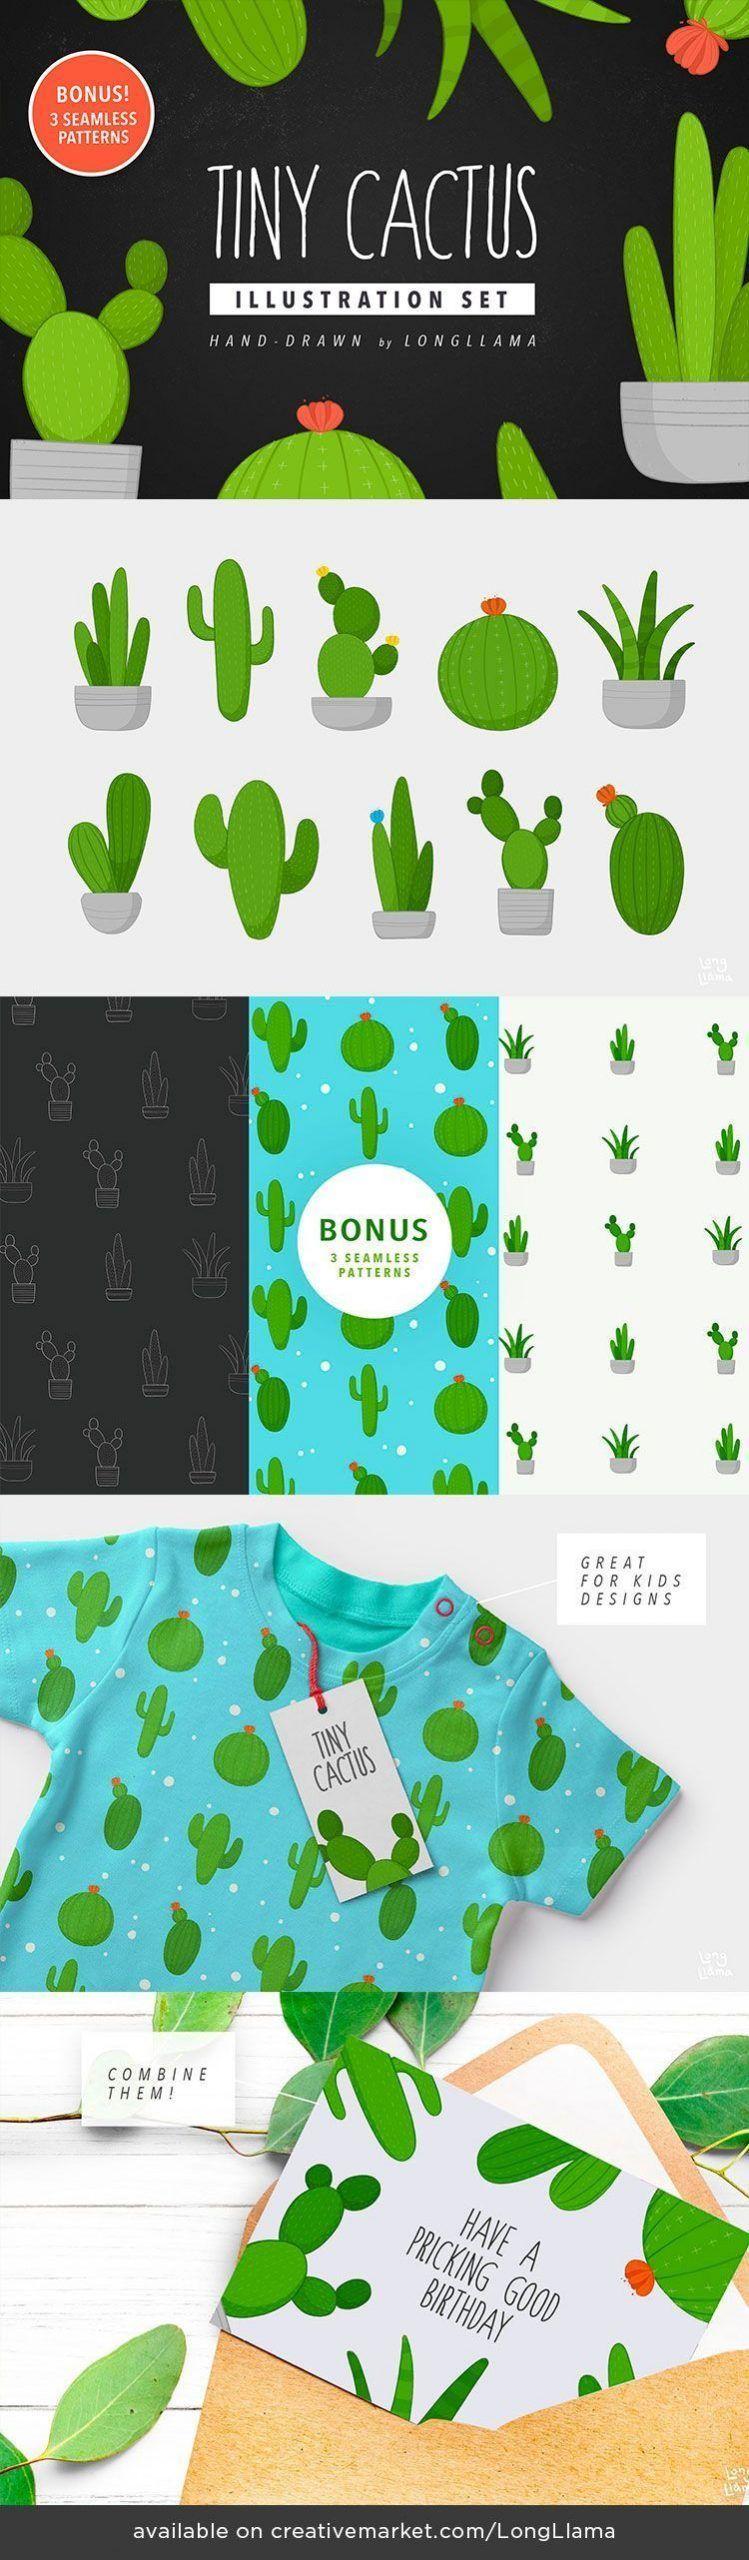 Tiny Cactus Illustration Set  hand-drawn by LongLlama Tiny Cactus Illustration S...#cactus #handdrawn #illustration #longllama #set #tiny